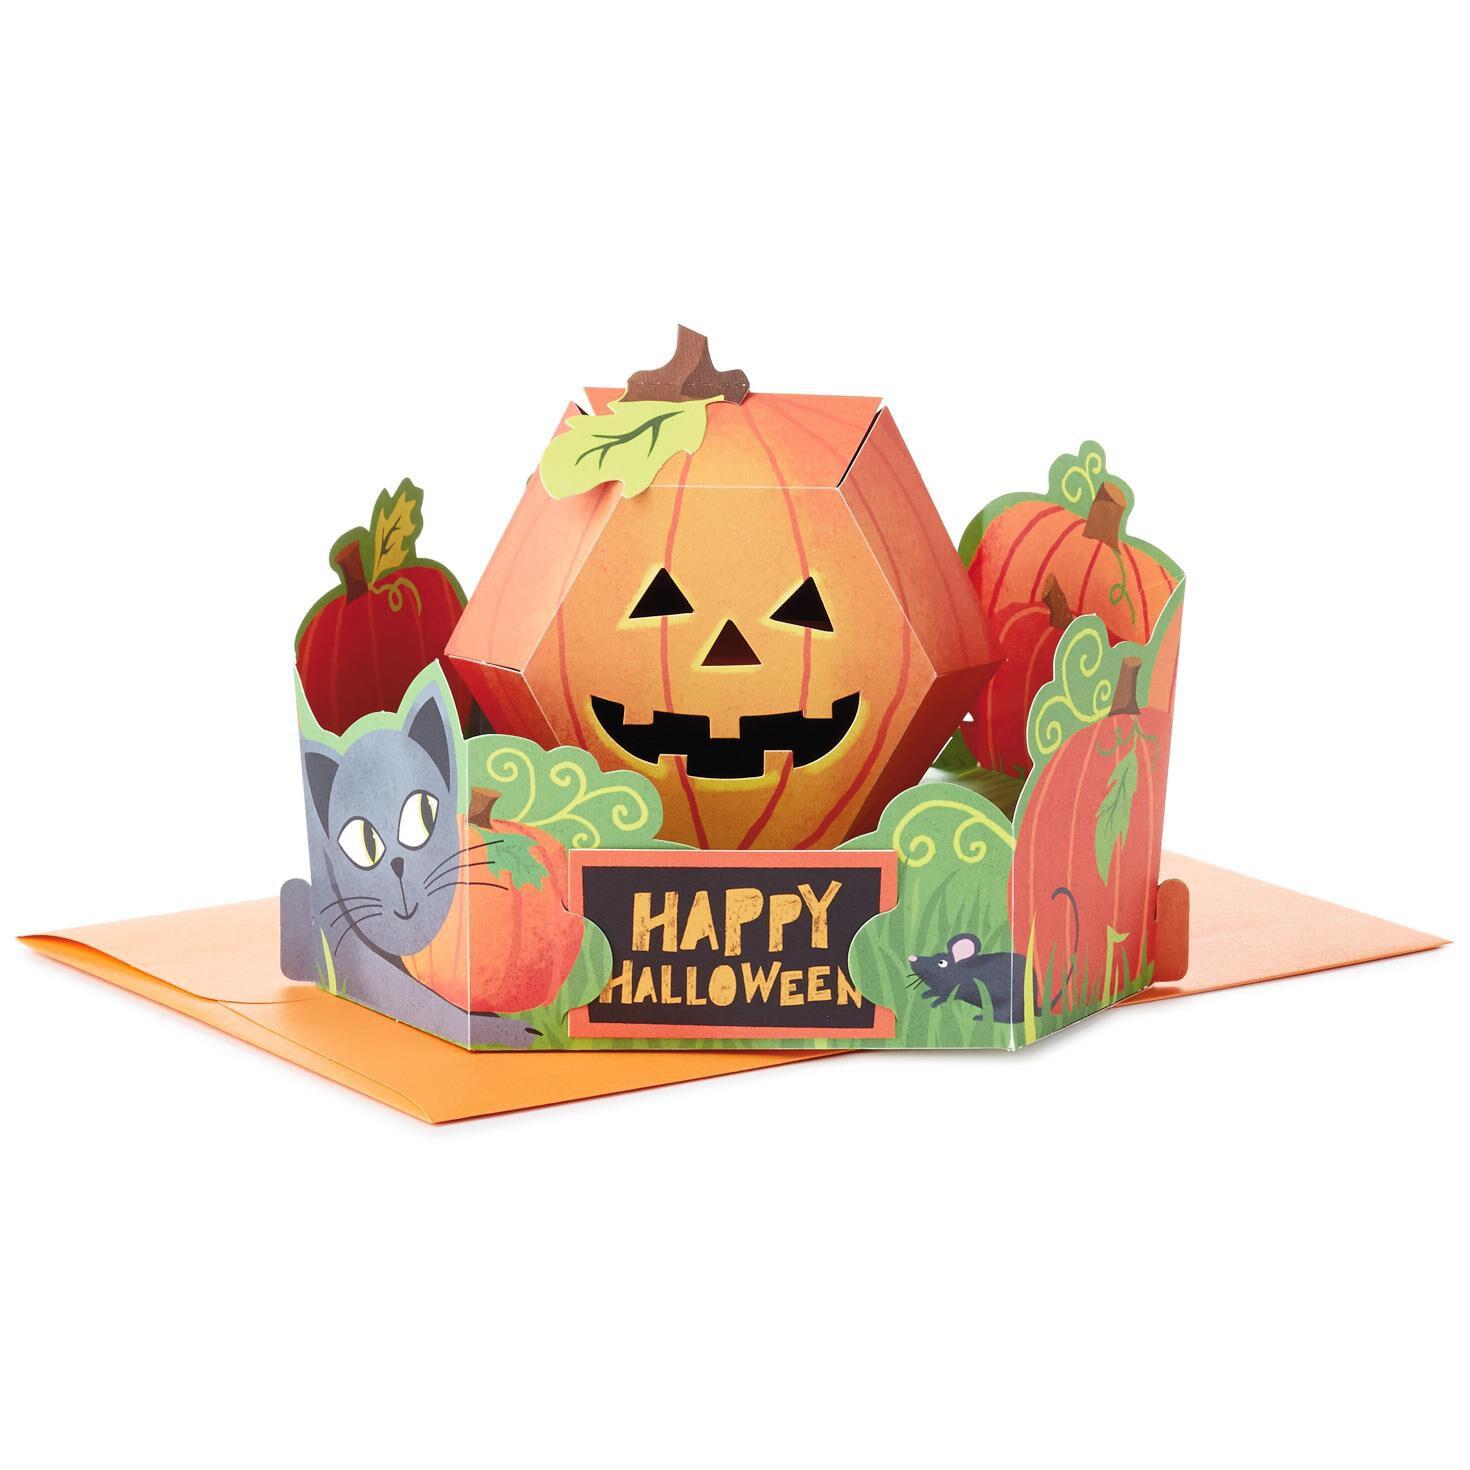 Cat and Pumpkin Pop Up Halloween Card - Greeting Cards - Hallmark